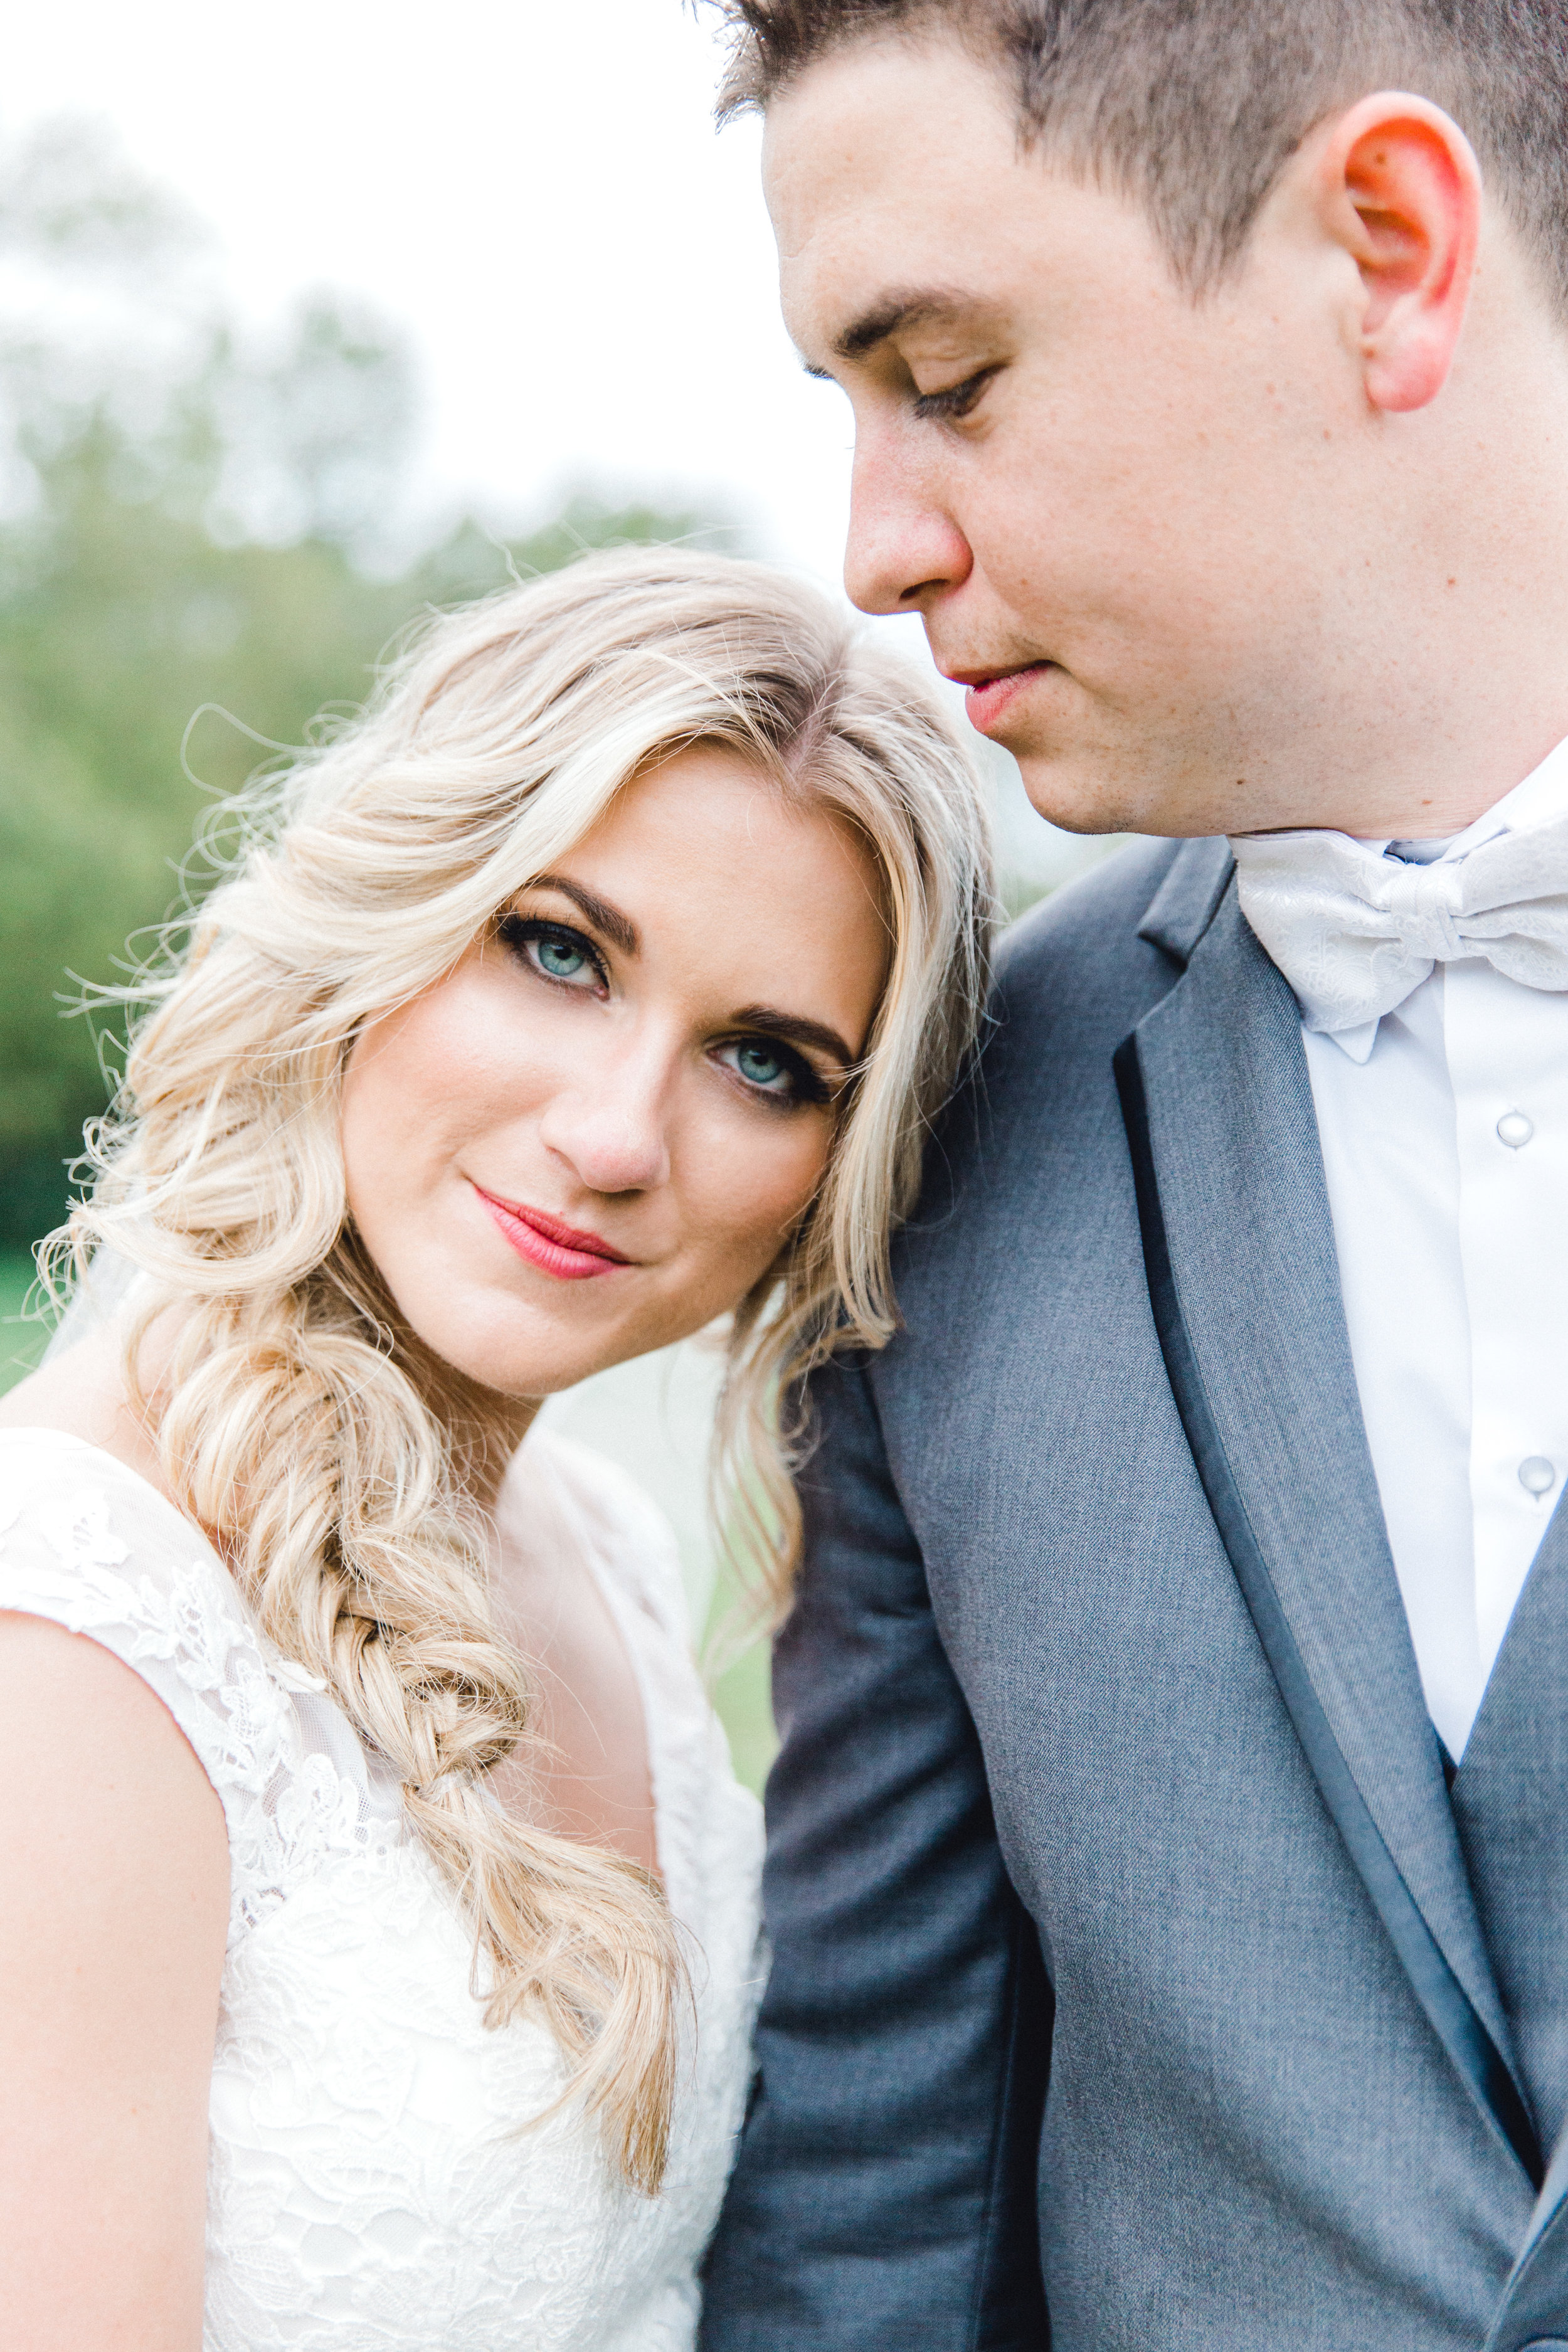 Paige-Mercer-Photography-Florida-Wedding-Photographer-Alyssa&Drew-74.jpg